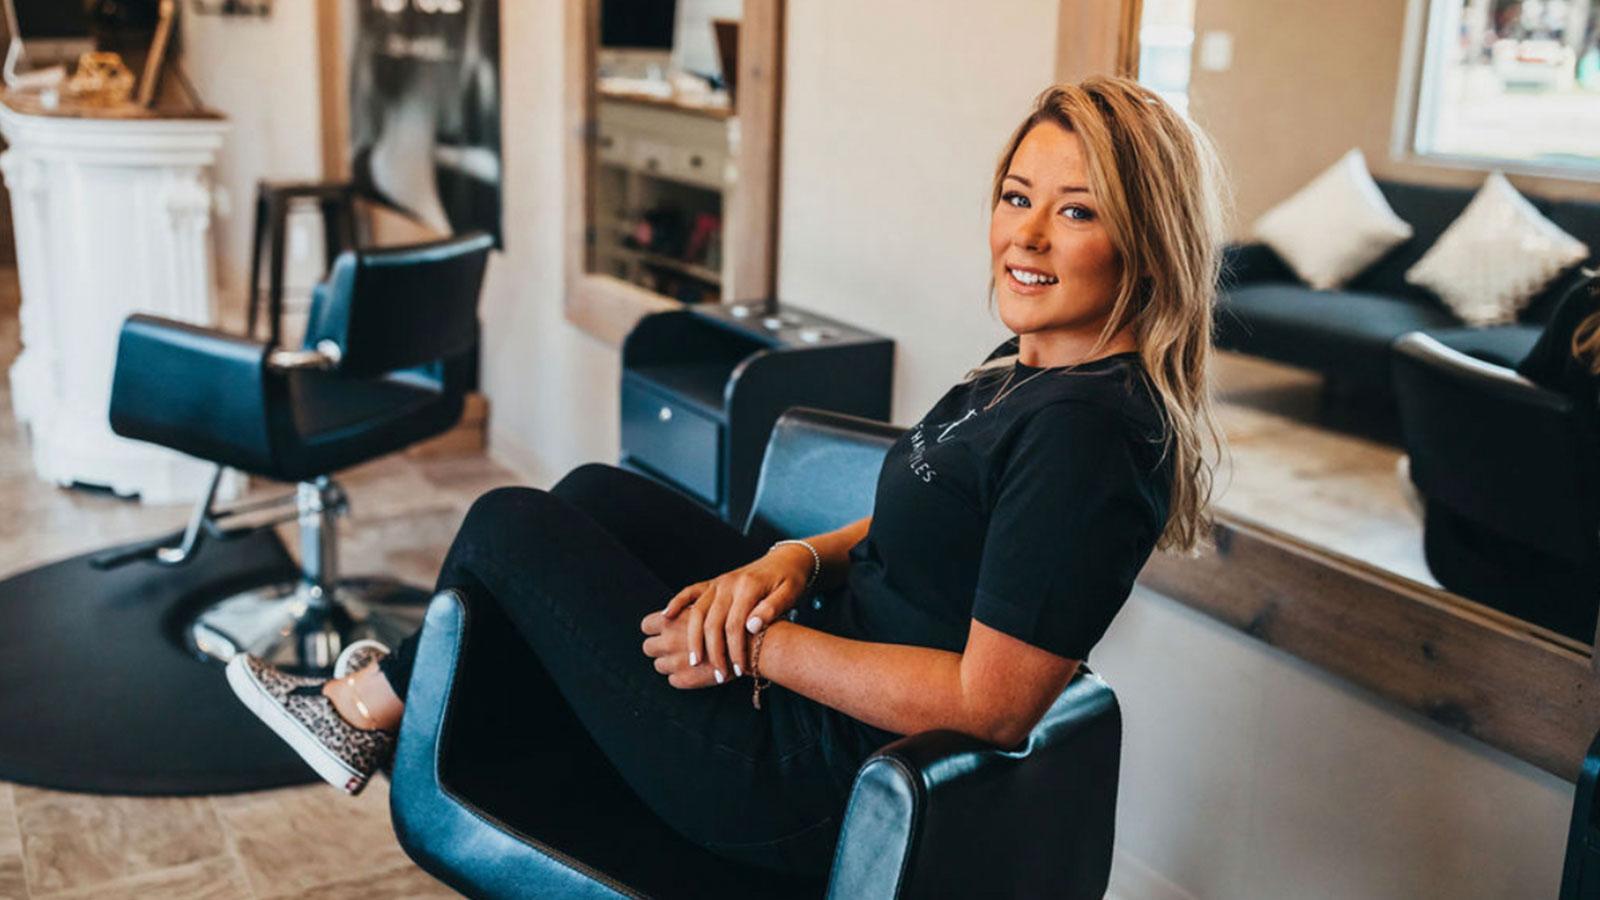 Stylist Spotlight: Taliya Hawley, Tease Hairstyles Studio